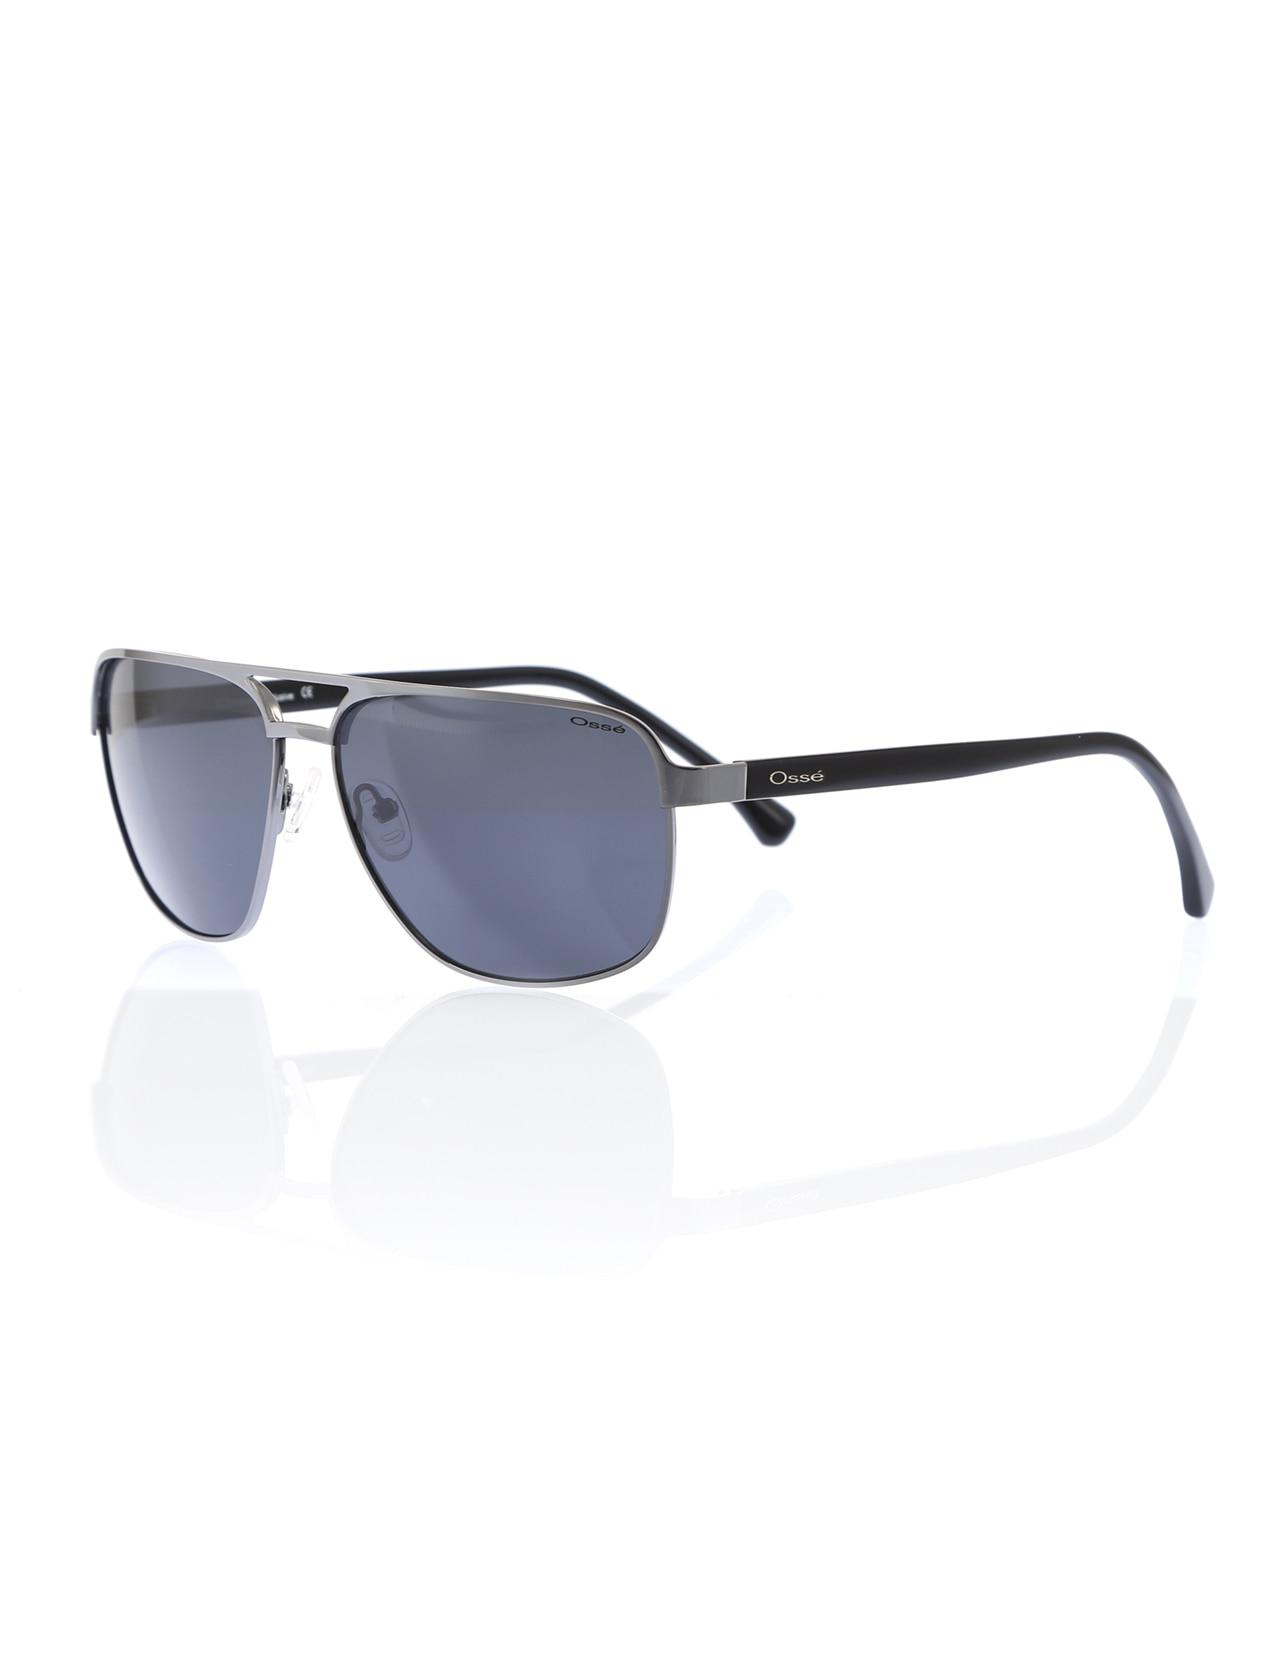 Men's sunglasses os 2848 02 metal metallic organic square square 61-12-145 osse